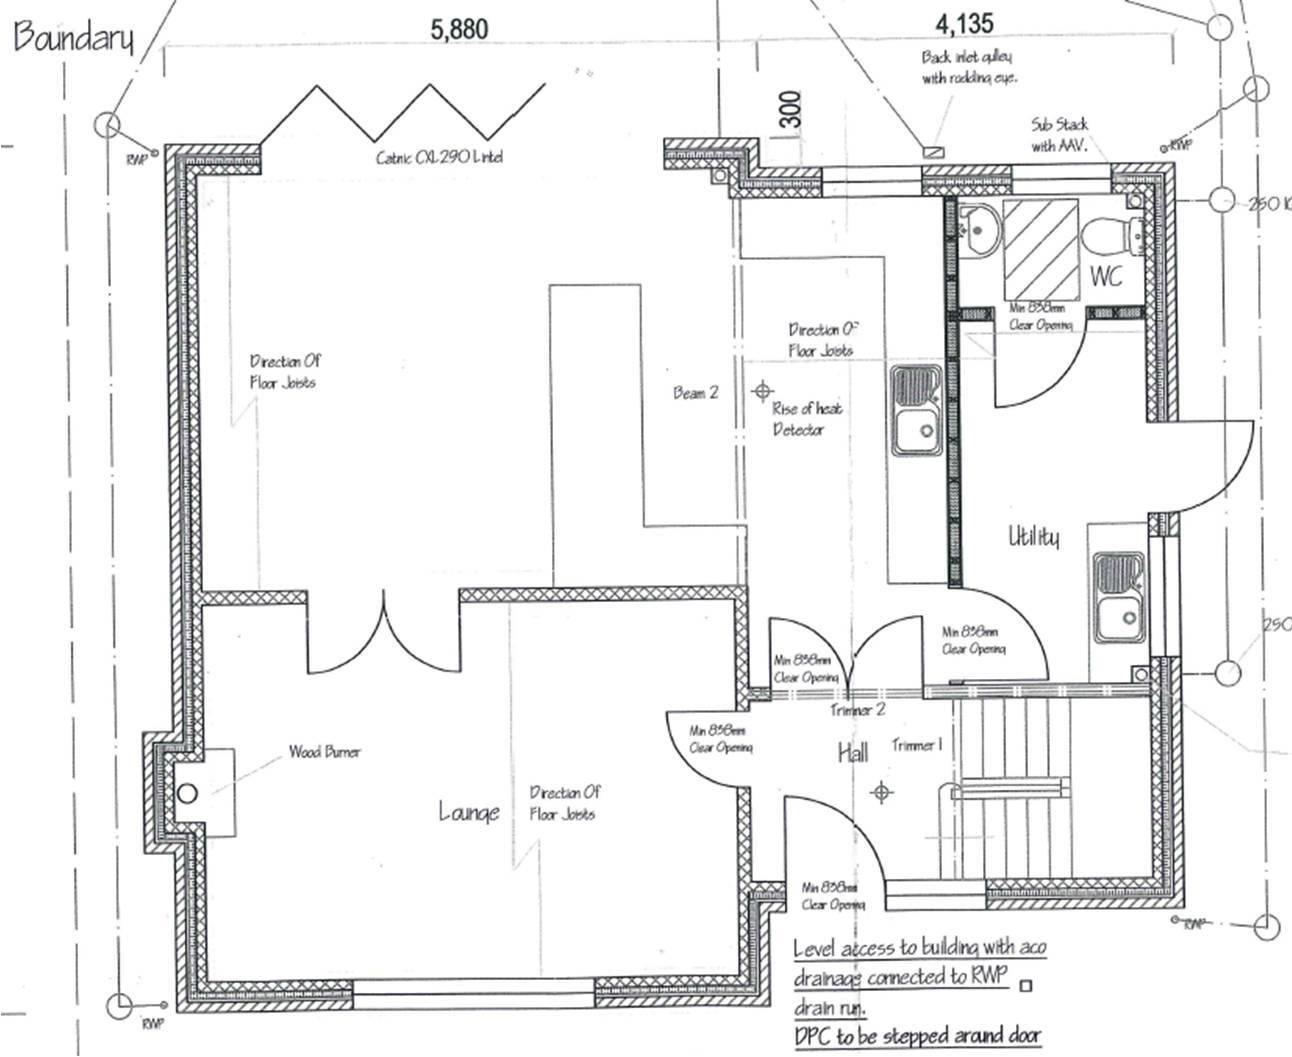 Property photo 1 of 5. Ground Floor Plan